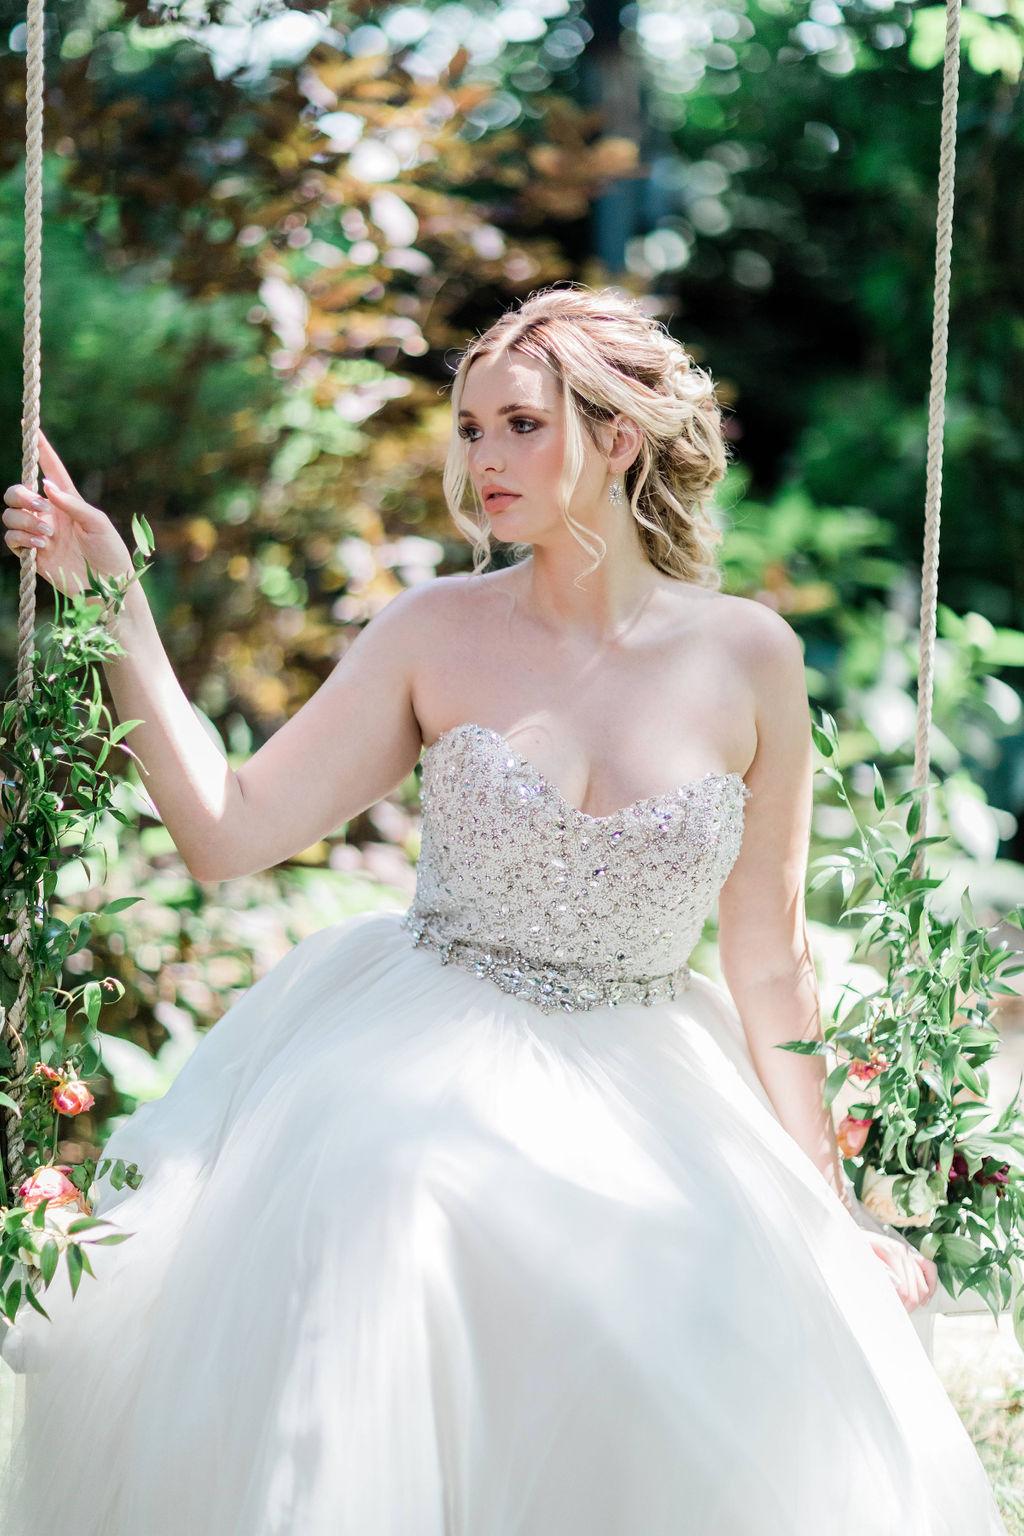 Kurtz-Orchards-Niagara-on-the-Lake-Styled-Wedding-Session-Shotlife-Studio-Calderone-Co-Luxury-Events-Vineyard-Bride-40.JPG